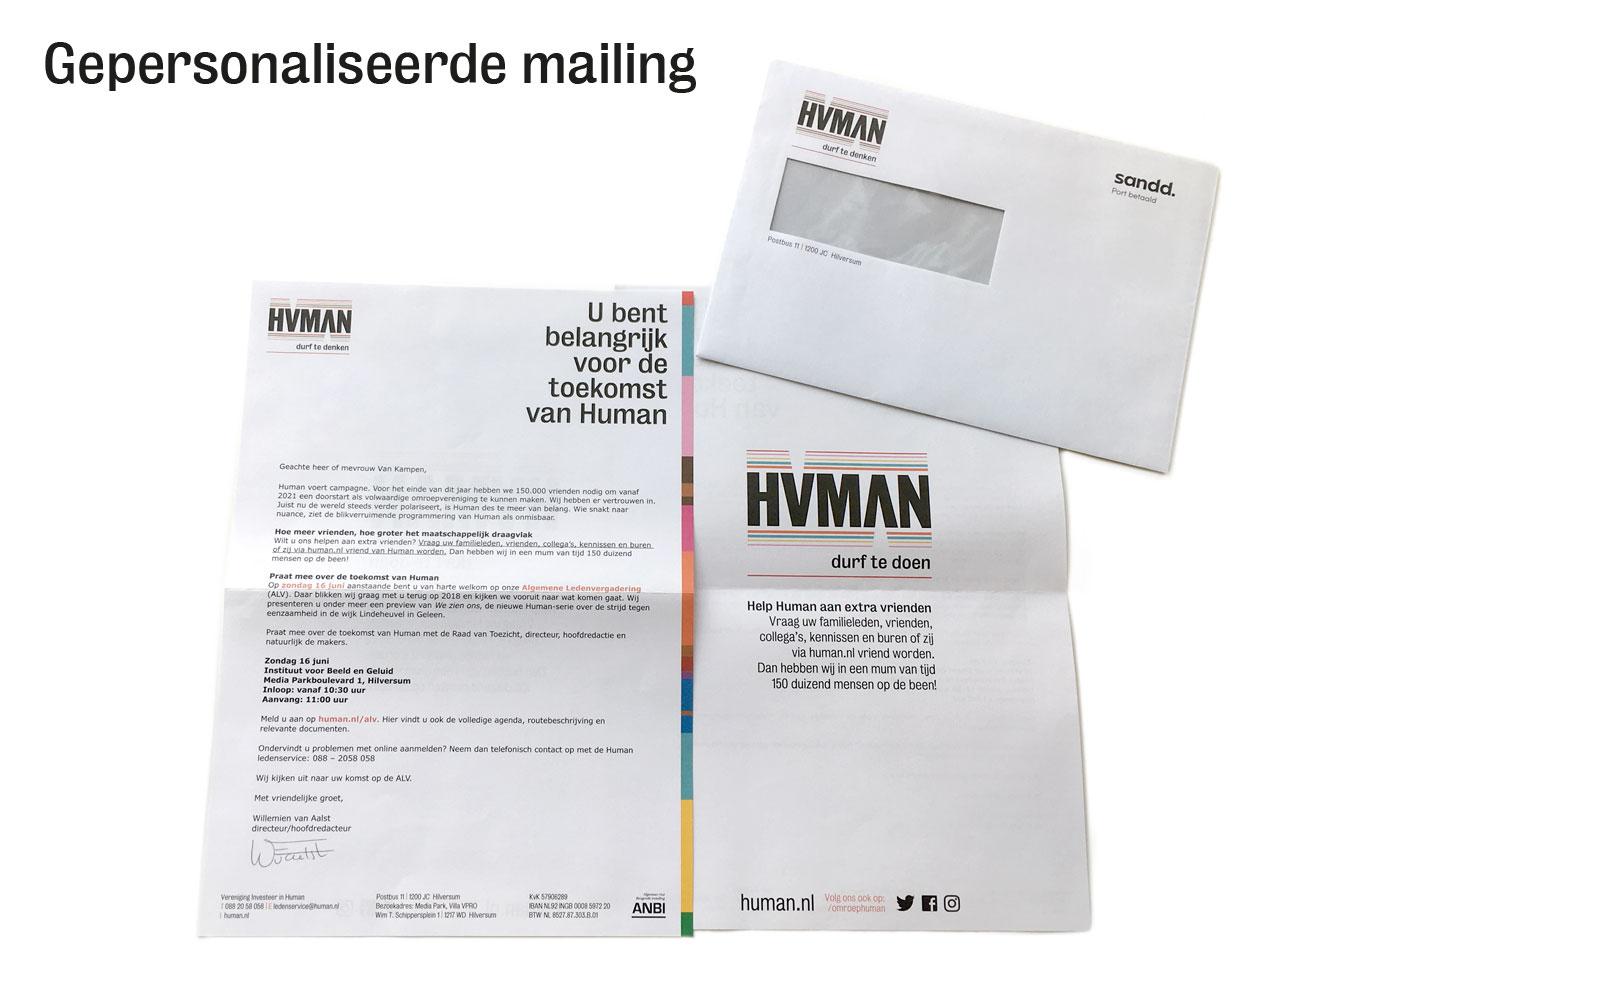 huisstijl-mailing-human